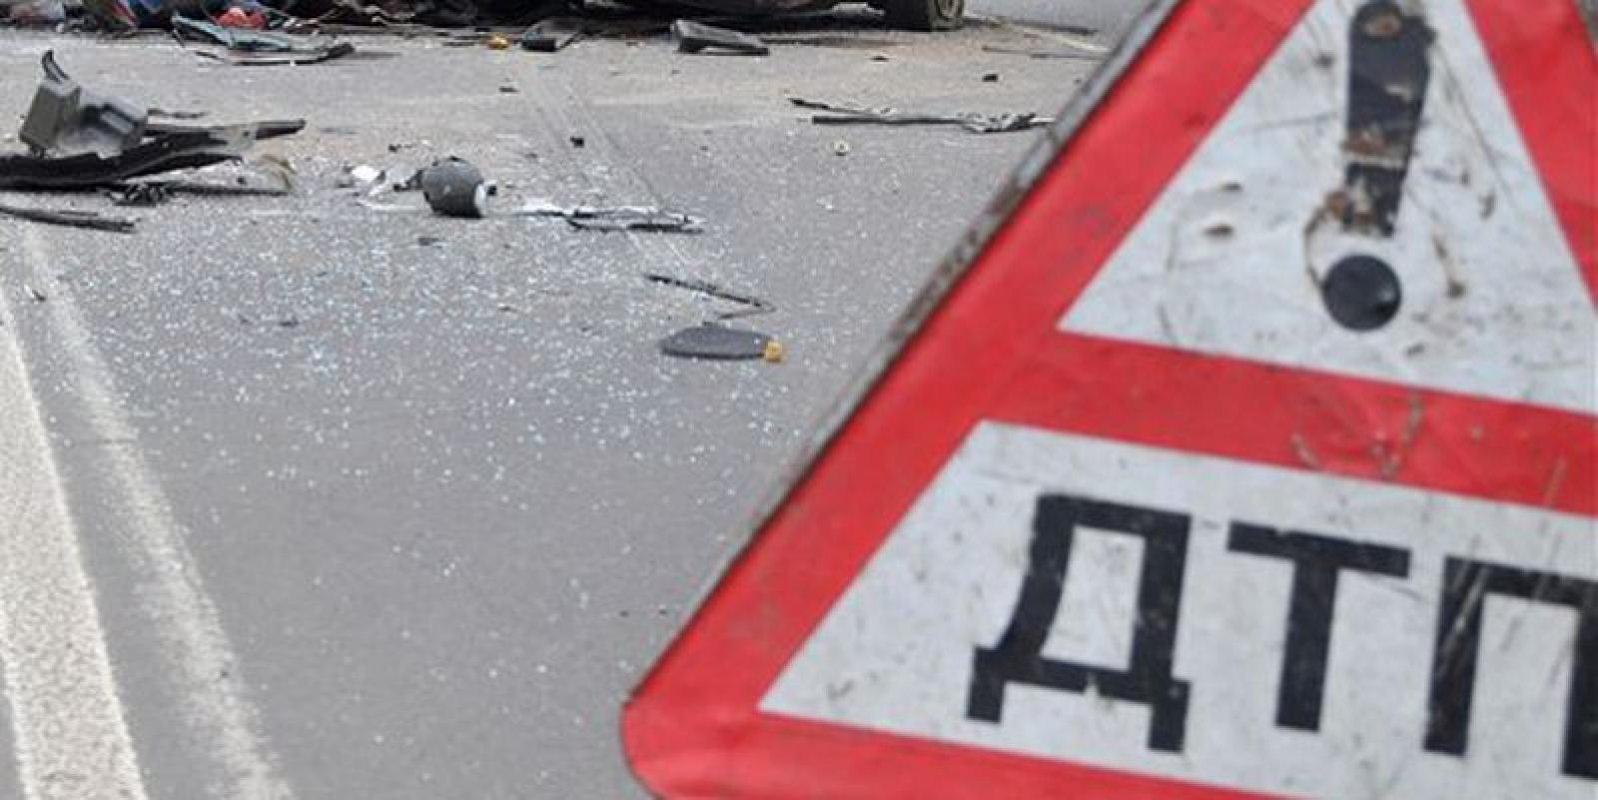 Под Симферополем Toyota влетела под КамАЗ: пассажир в коме